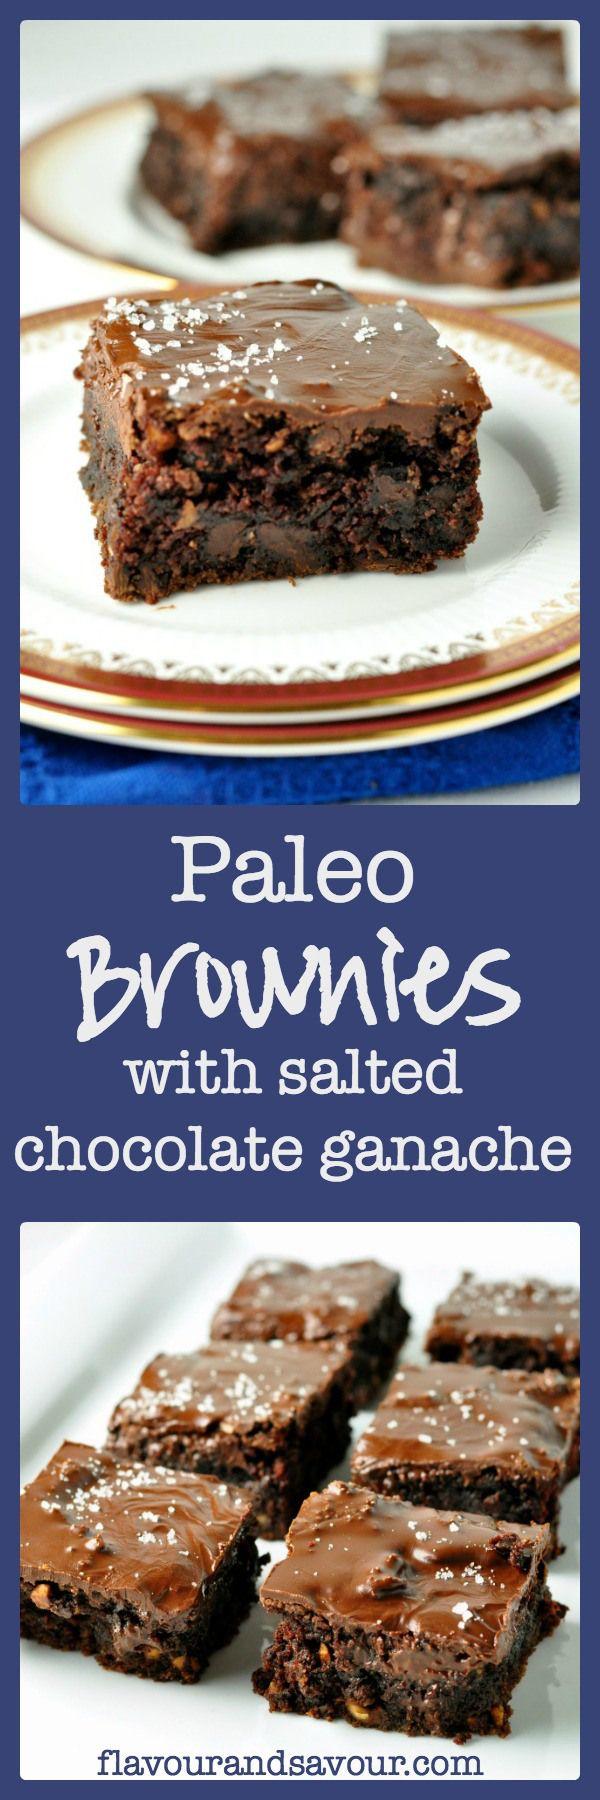 Paleo Brownies with Salted Chocolate Ganache. Oh my. |www.flavourandsavour.com